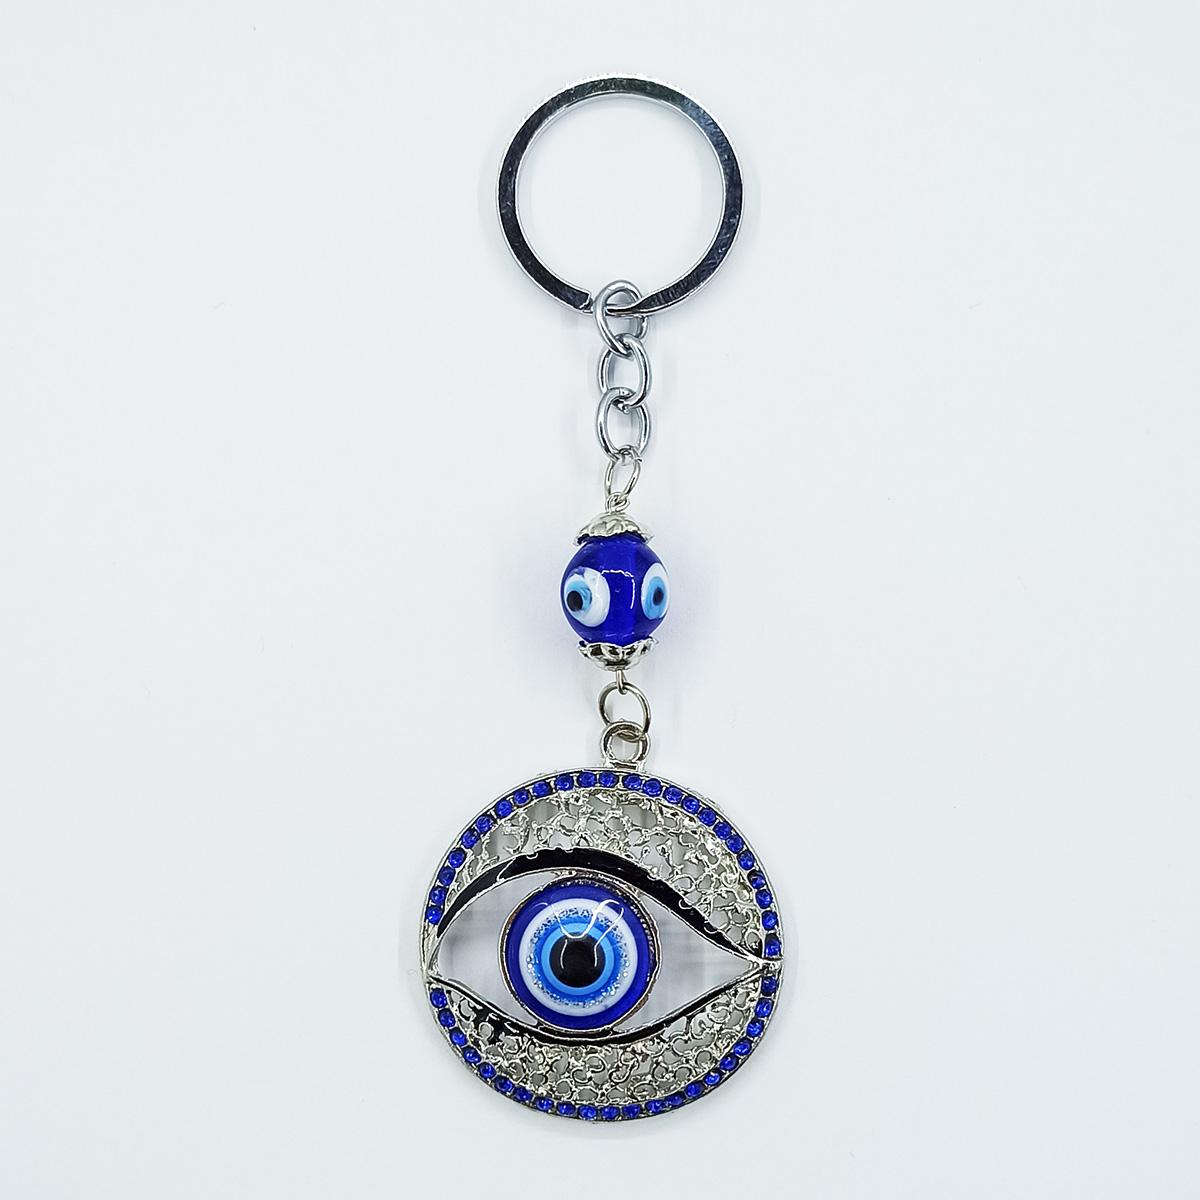 جاکلیدی سلین کالا مدل چشم زخم کد ce-As19